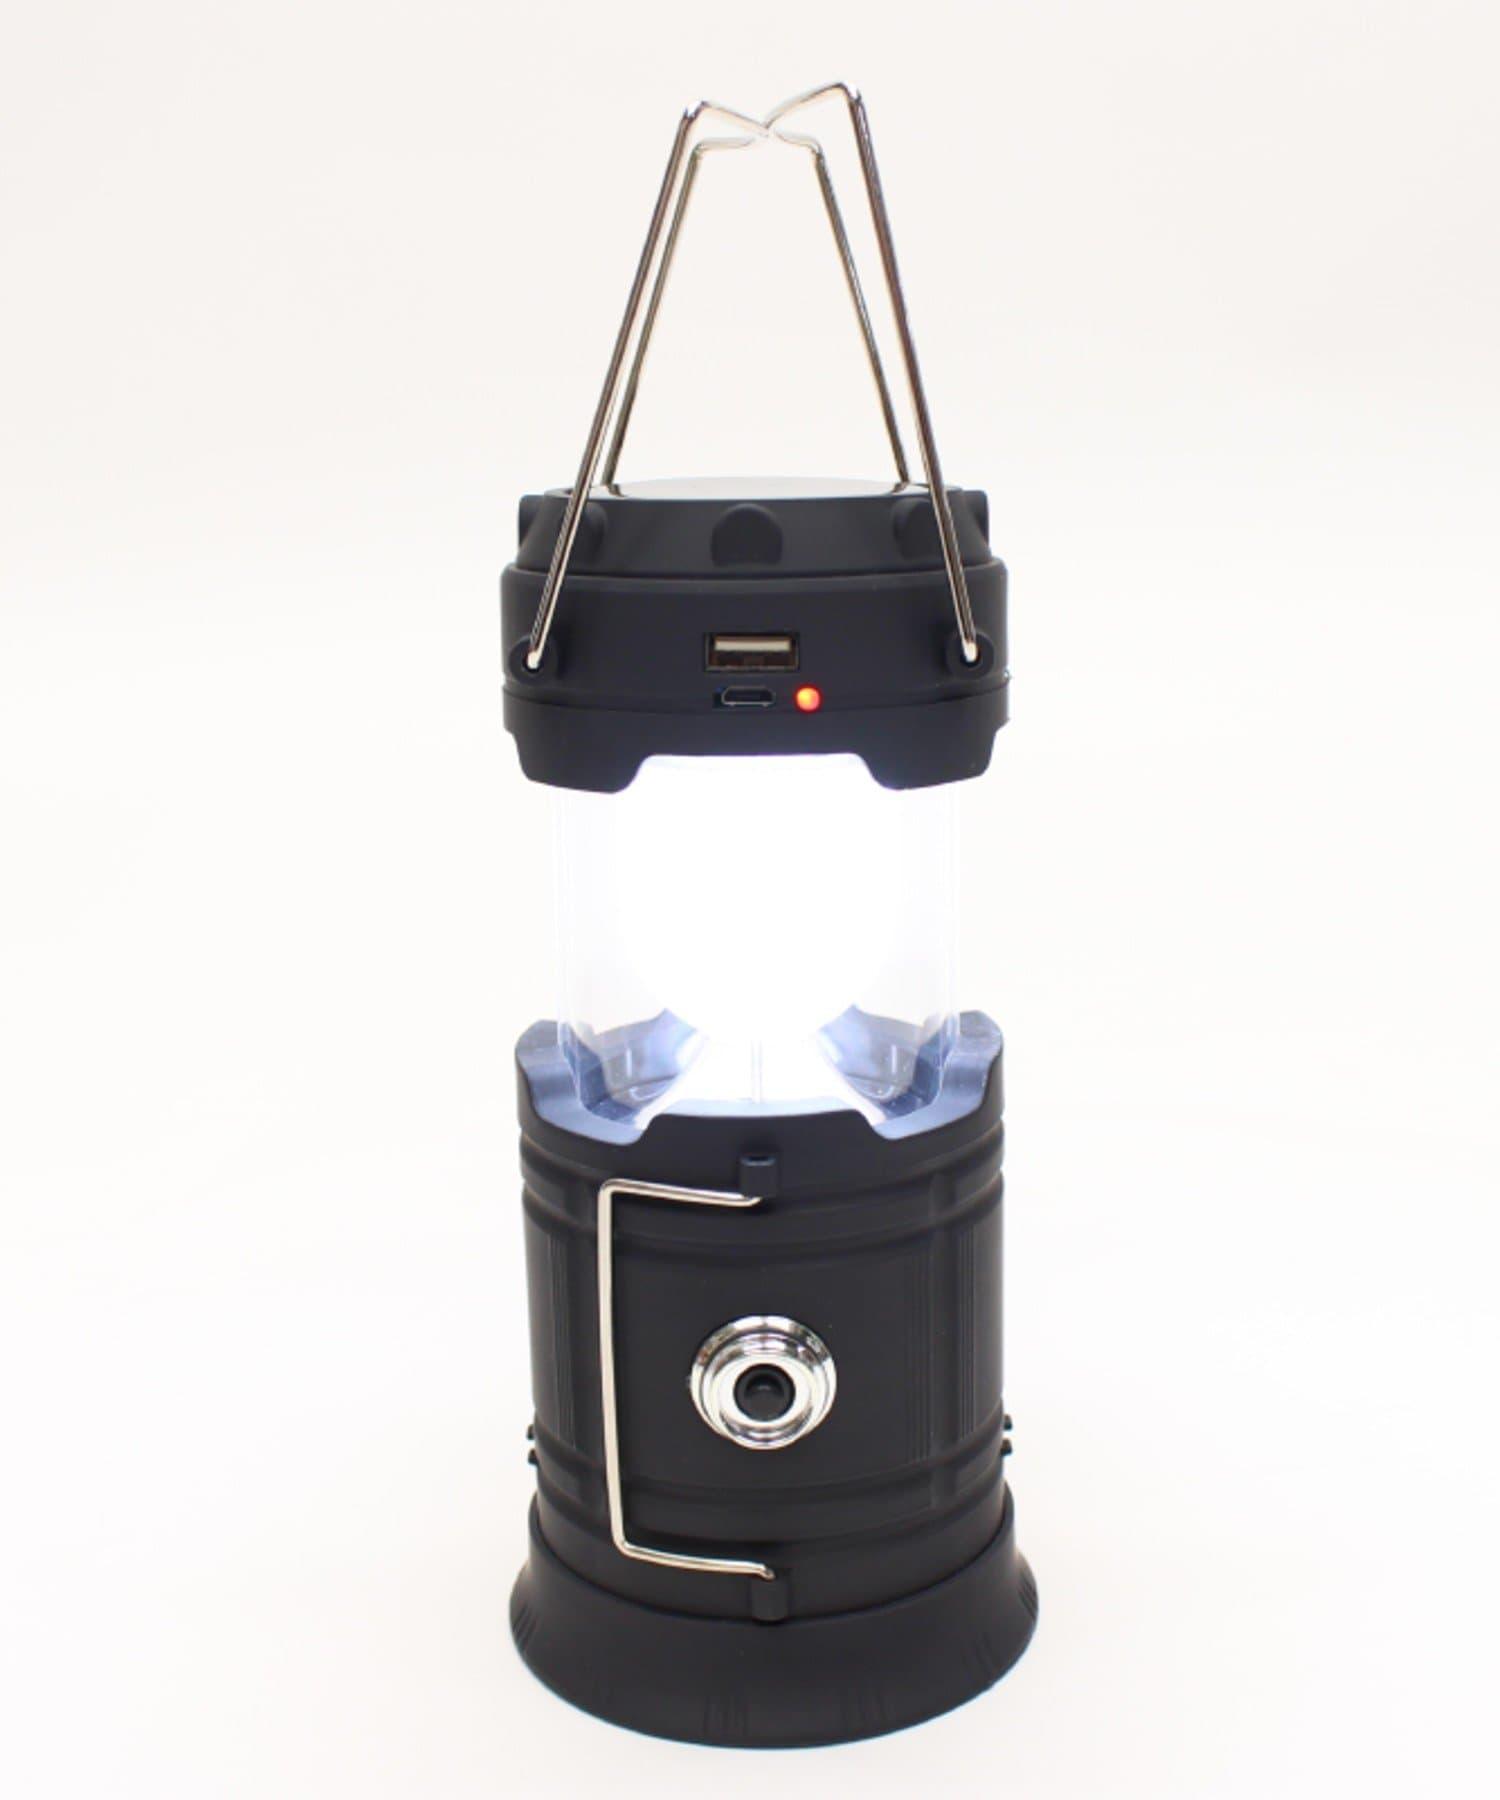 COLONY 2139(コロニー トゥーワンスリーナイン) ライフスタイル モバイルチャージ付きソーラーランタン ブラック